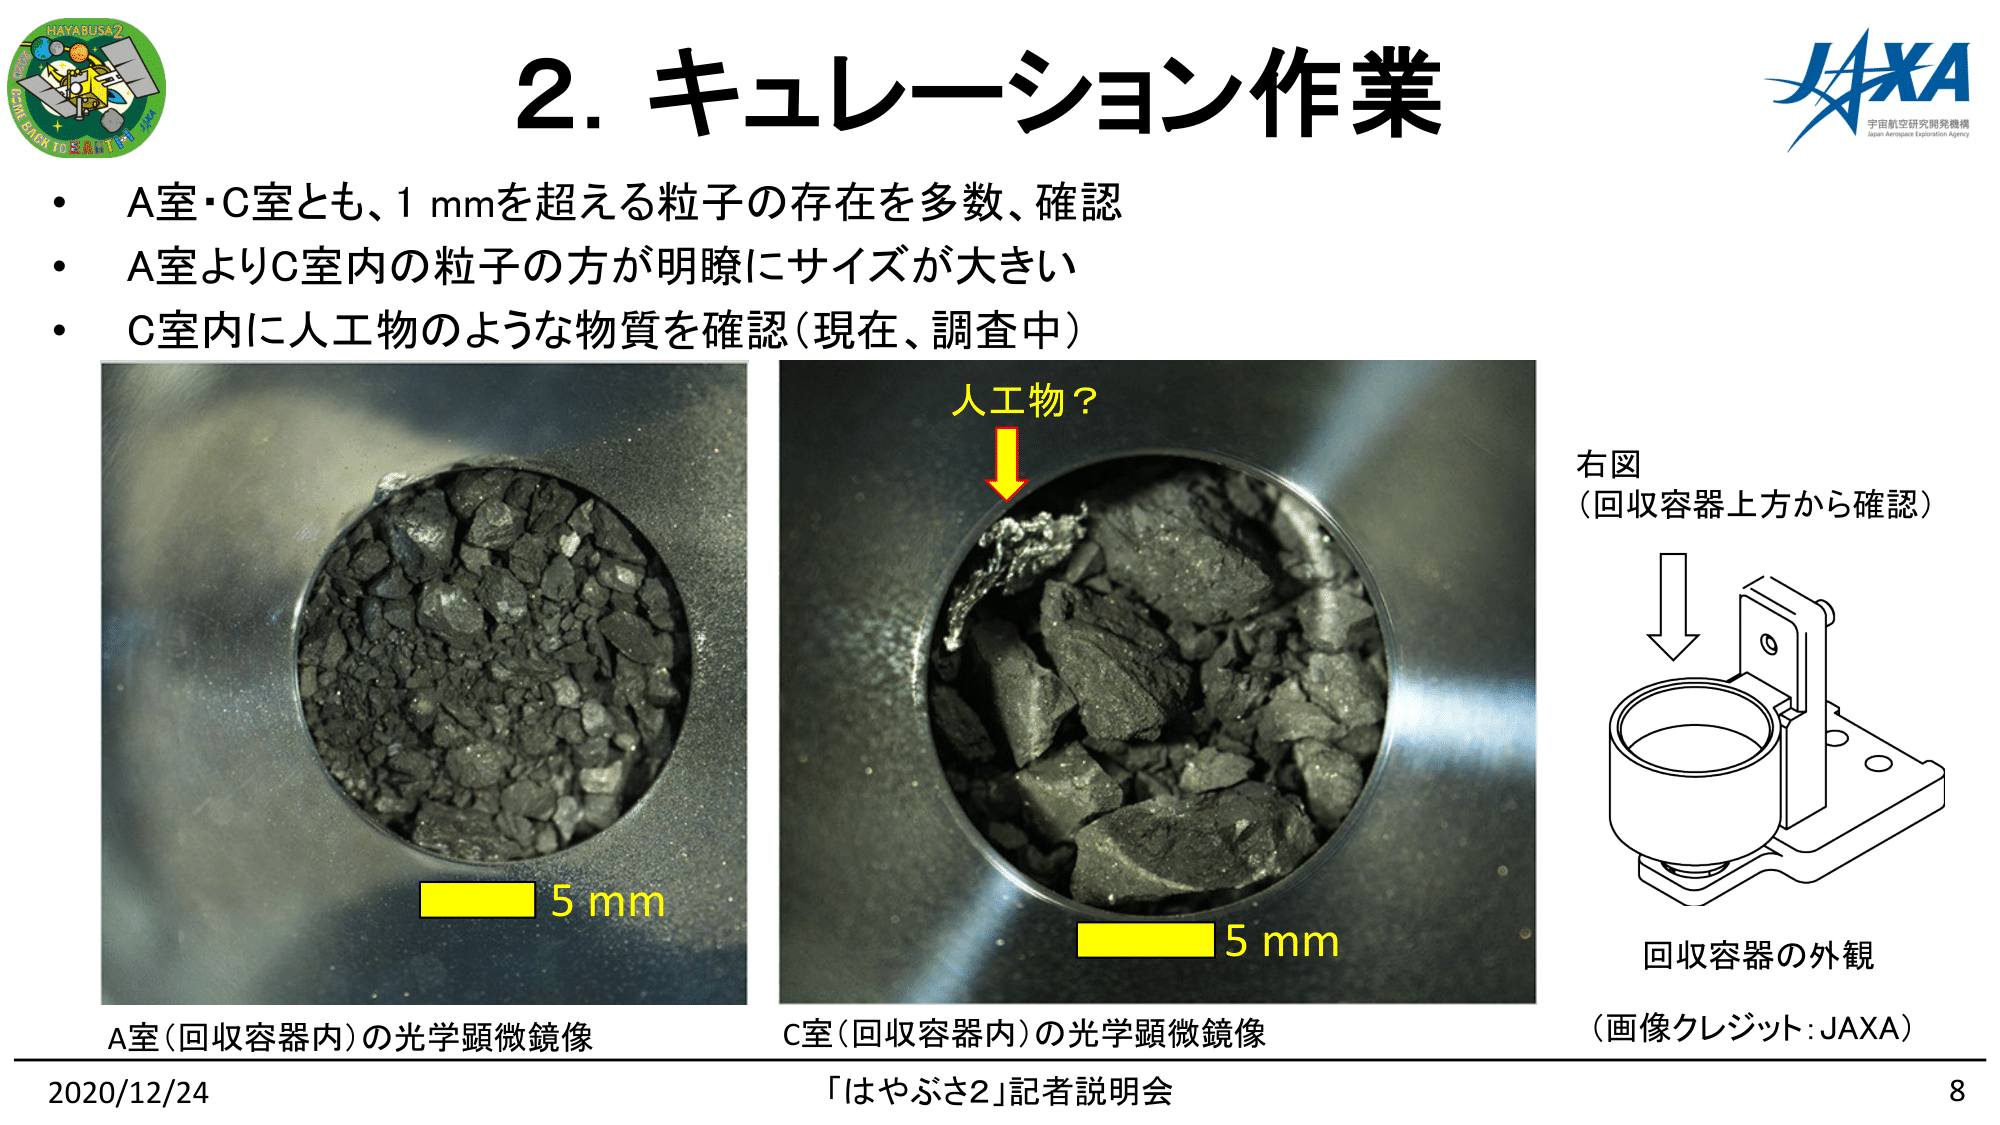 f:id:Imamura:20201224135032p:plain